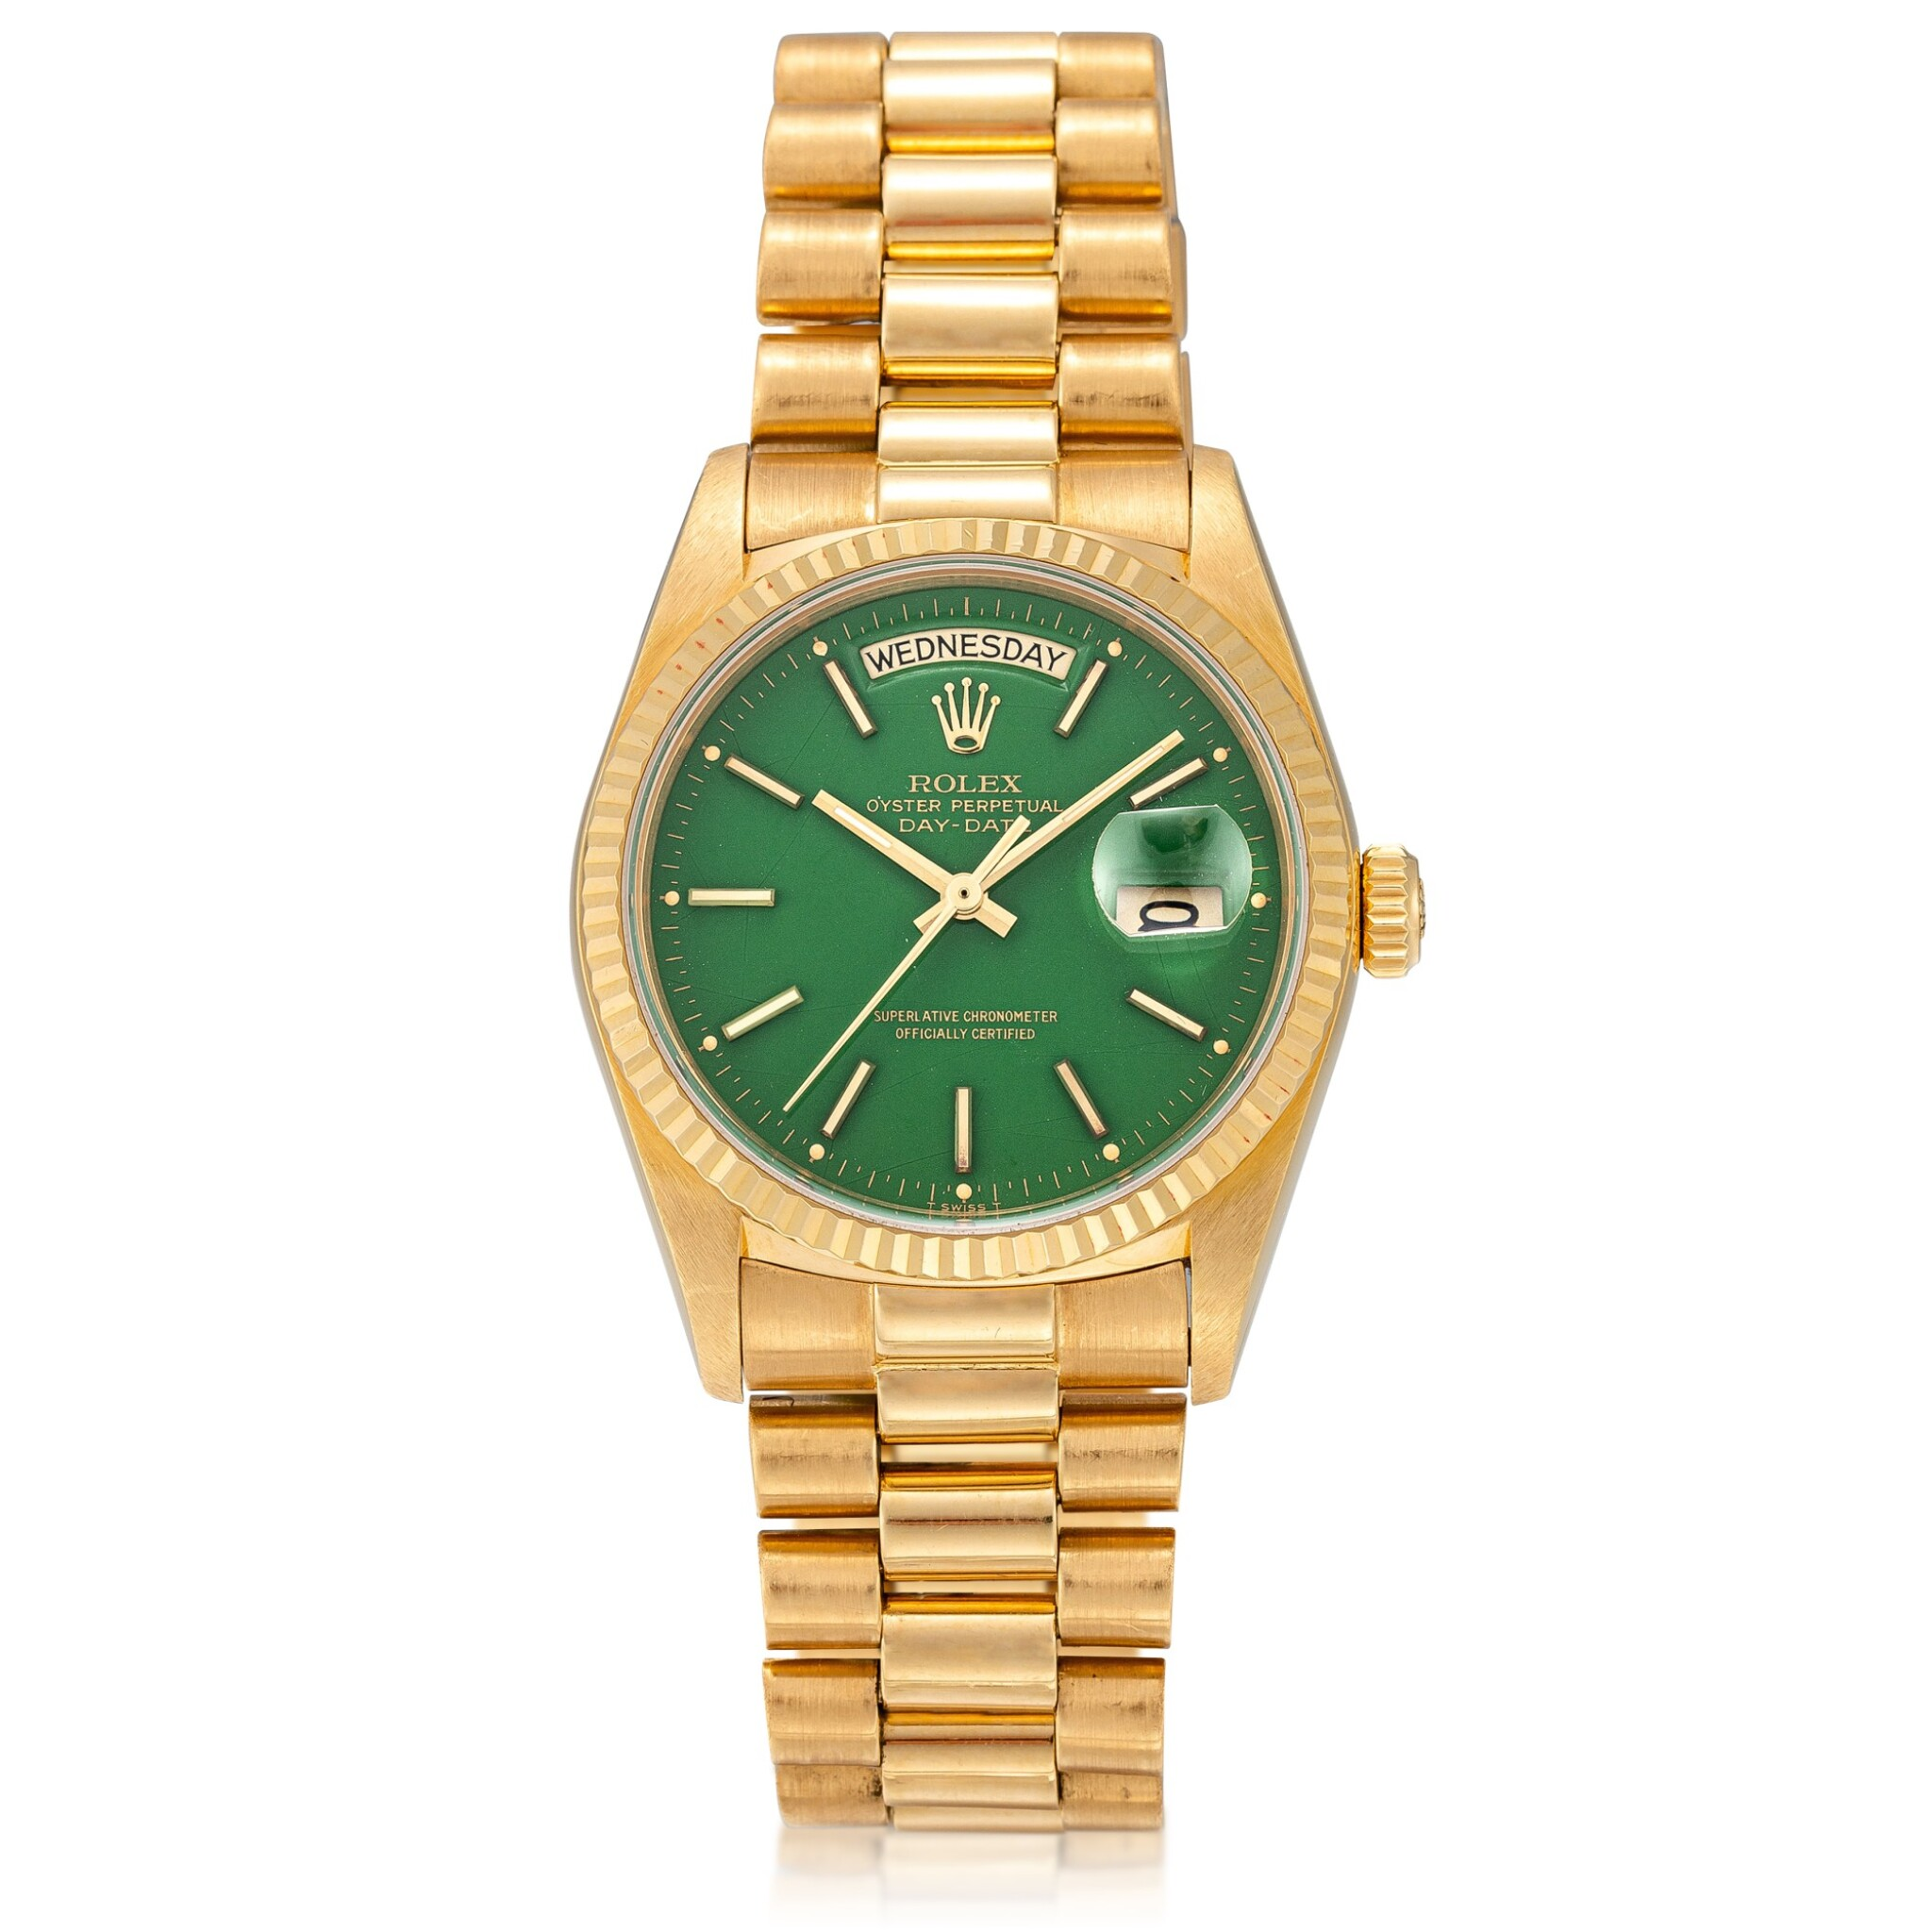 View full screen - View 1 of Lot 54. 'Stella' Day-Date, Ref. 18038 Yellow gold wristwatch with day, date, bracelet and green 'stella' dial Circa 1988   勞力士18038型號「'Stella' Day-Date」黃金鍊帶腕錶備星期、日期顯示及綠色 Stella 錶盤,年份約1988.